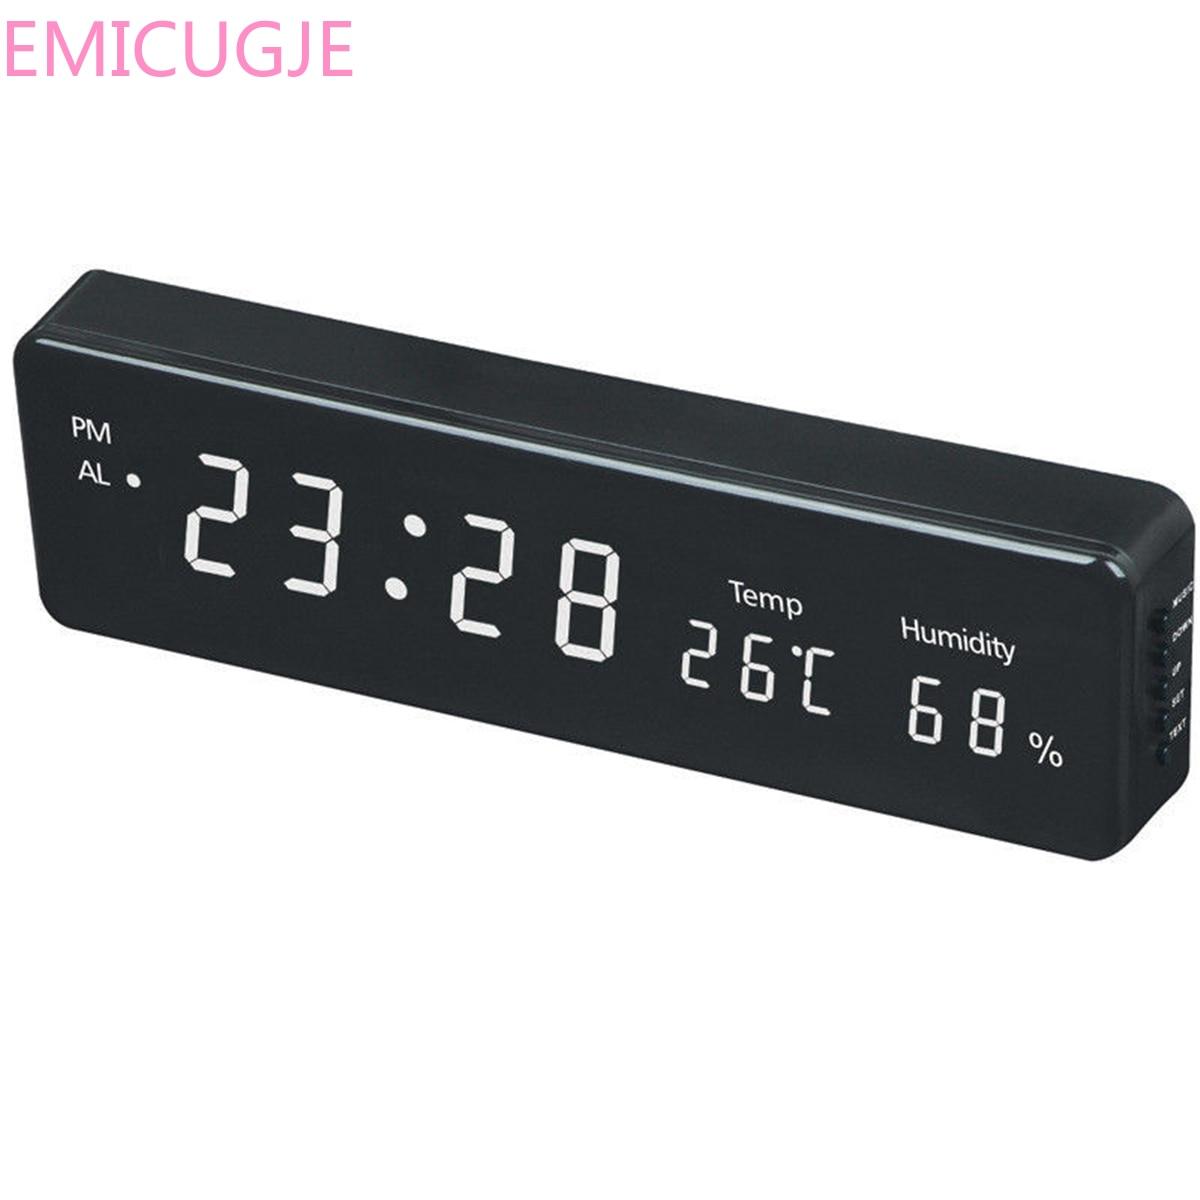 Humidity Display Desk Table Clocks Electronic LED Wall Watch Decor EU Plug Digital Wall Clock Big LED Time Calendar Temperature